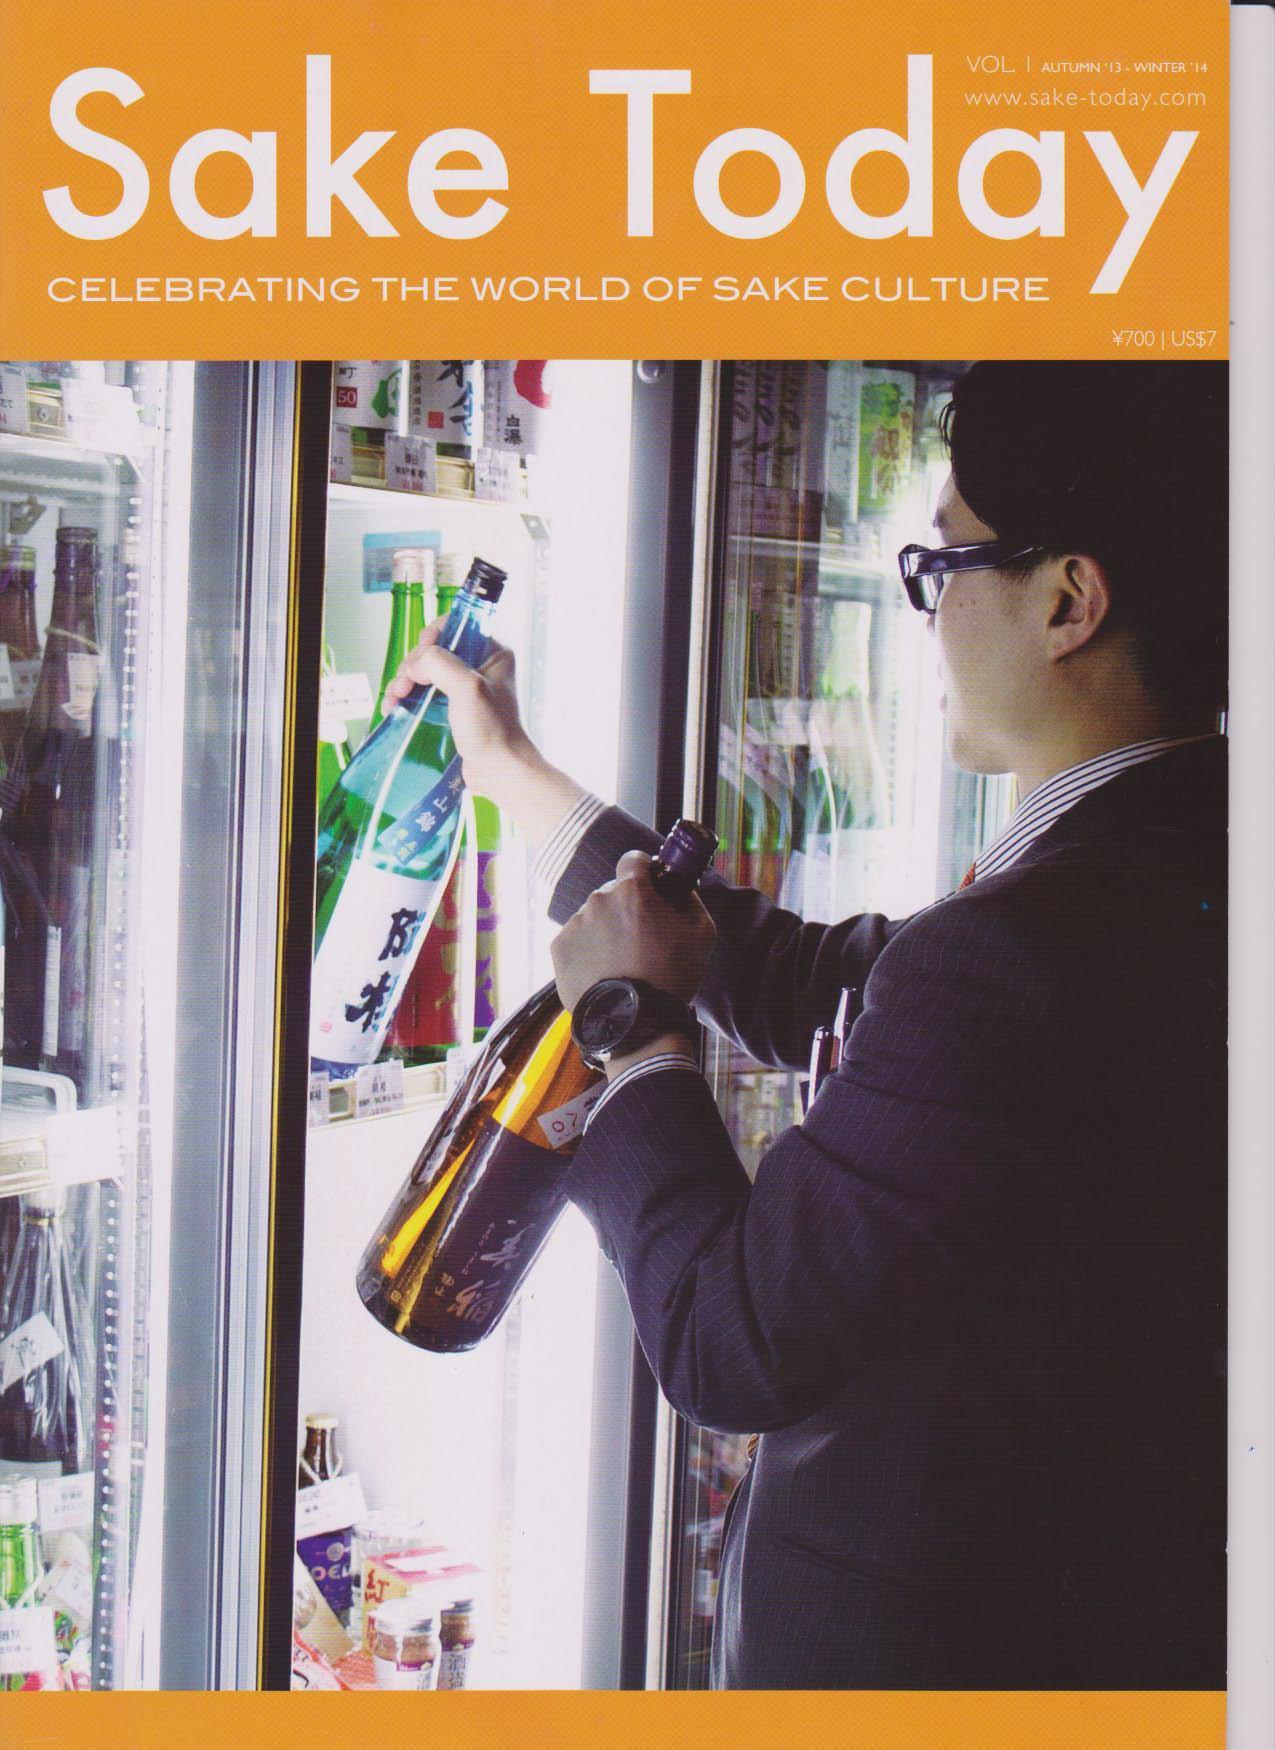 SakeToday - the Magazine